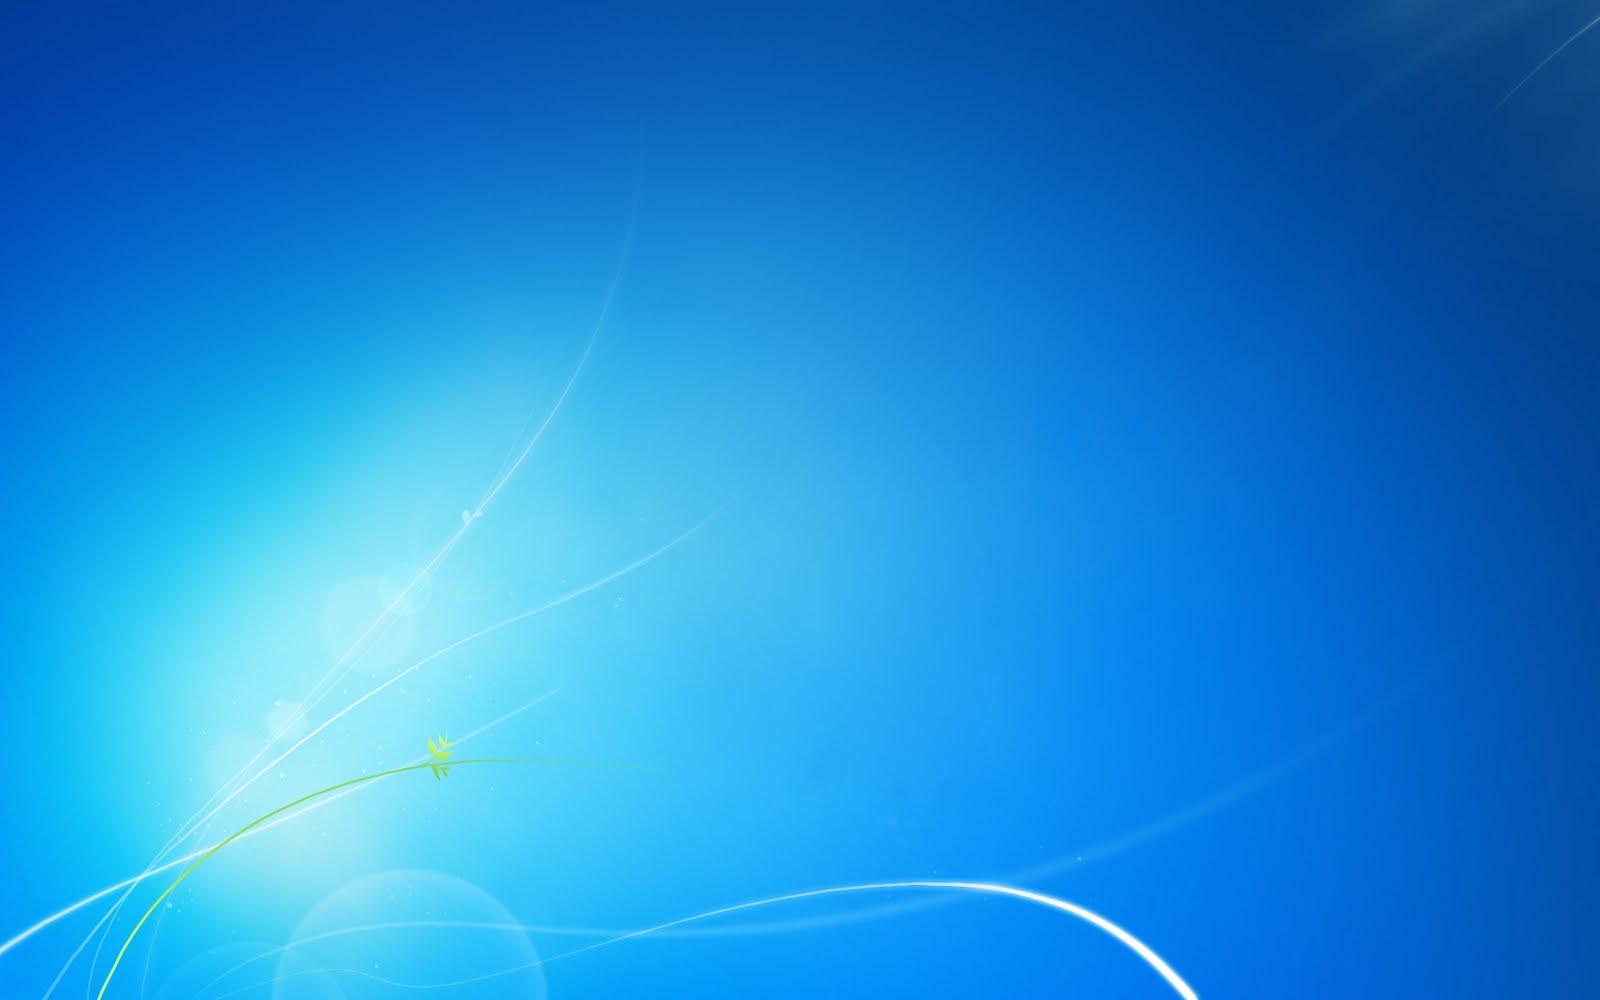 Windows 7 Reflective Wallpapers 29 Wallpapers Art